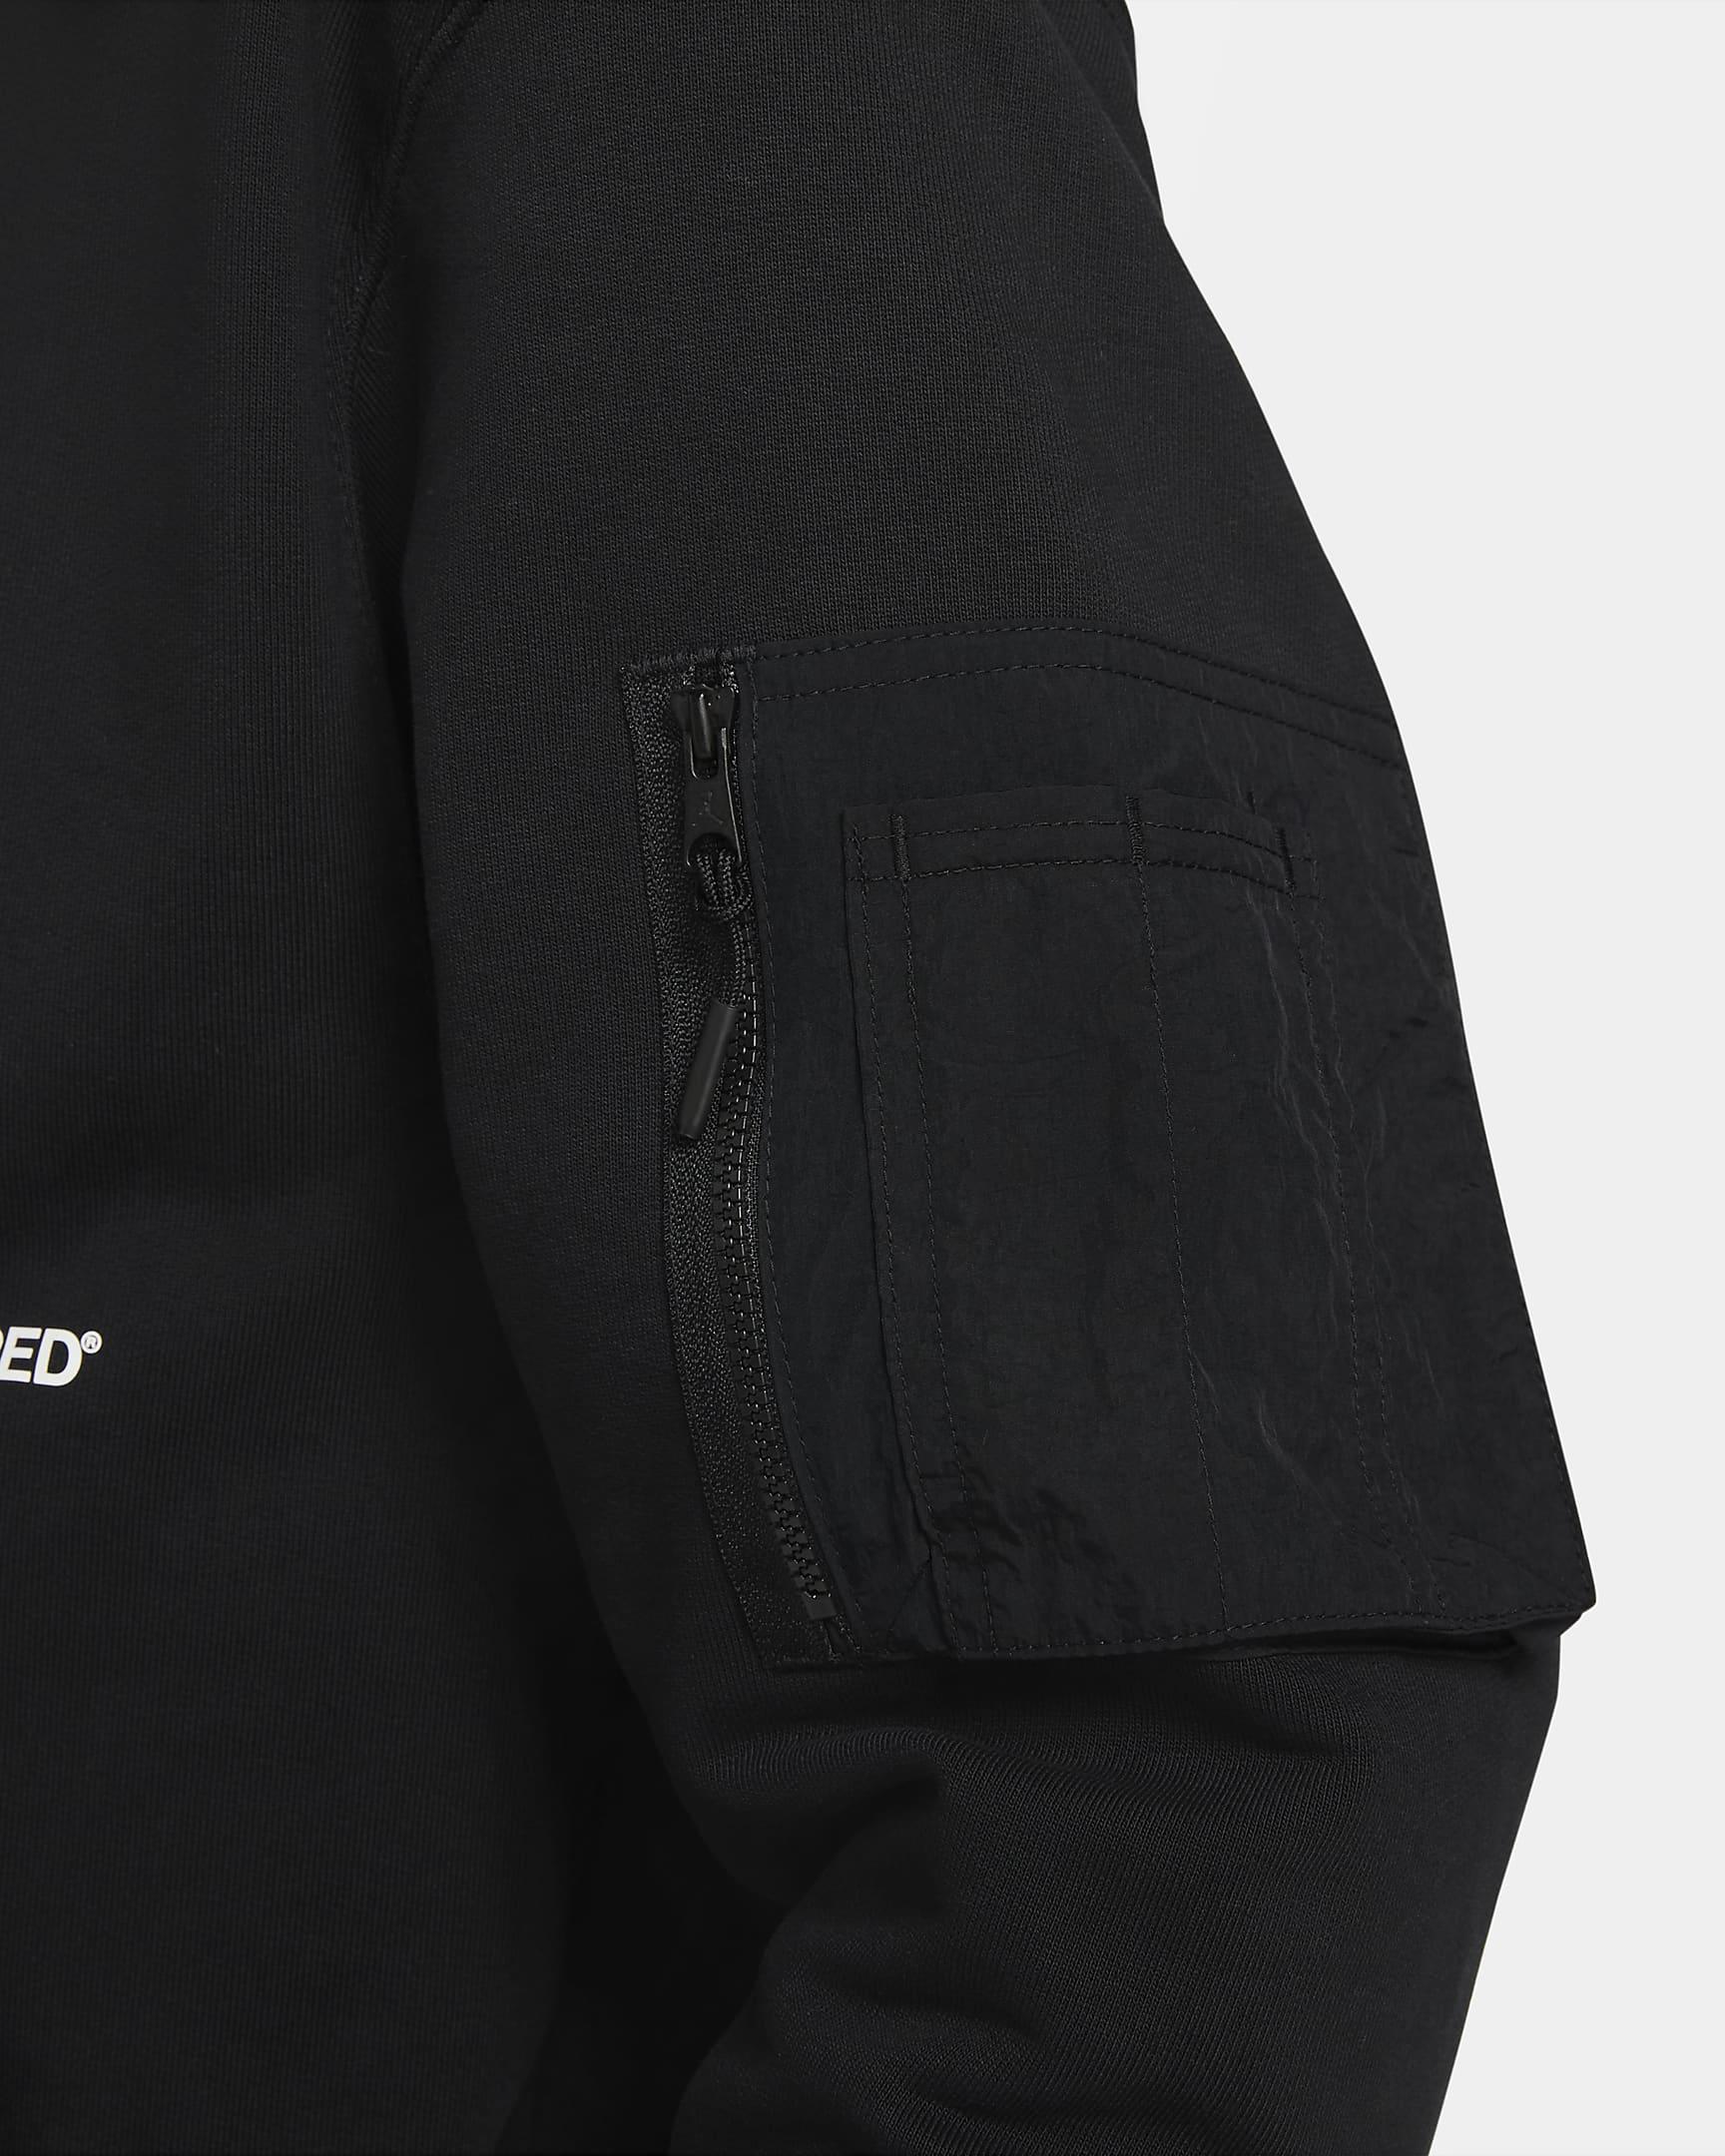 jordan-23-engineered-mens-fleece-pullover-hoodie-QbRhJ5-5.png